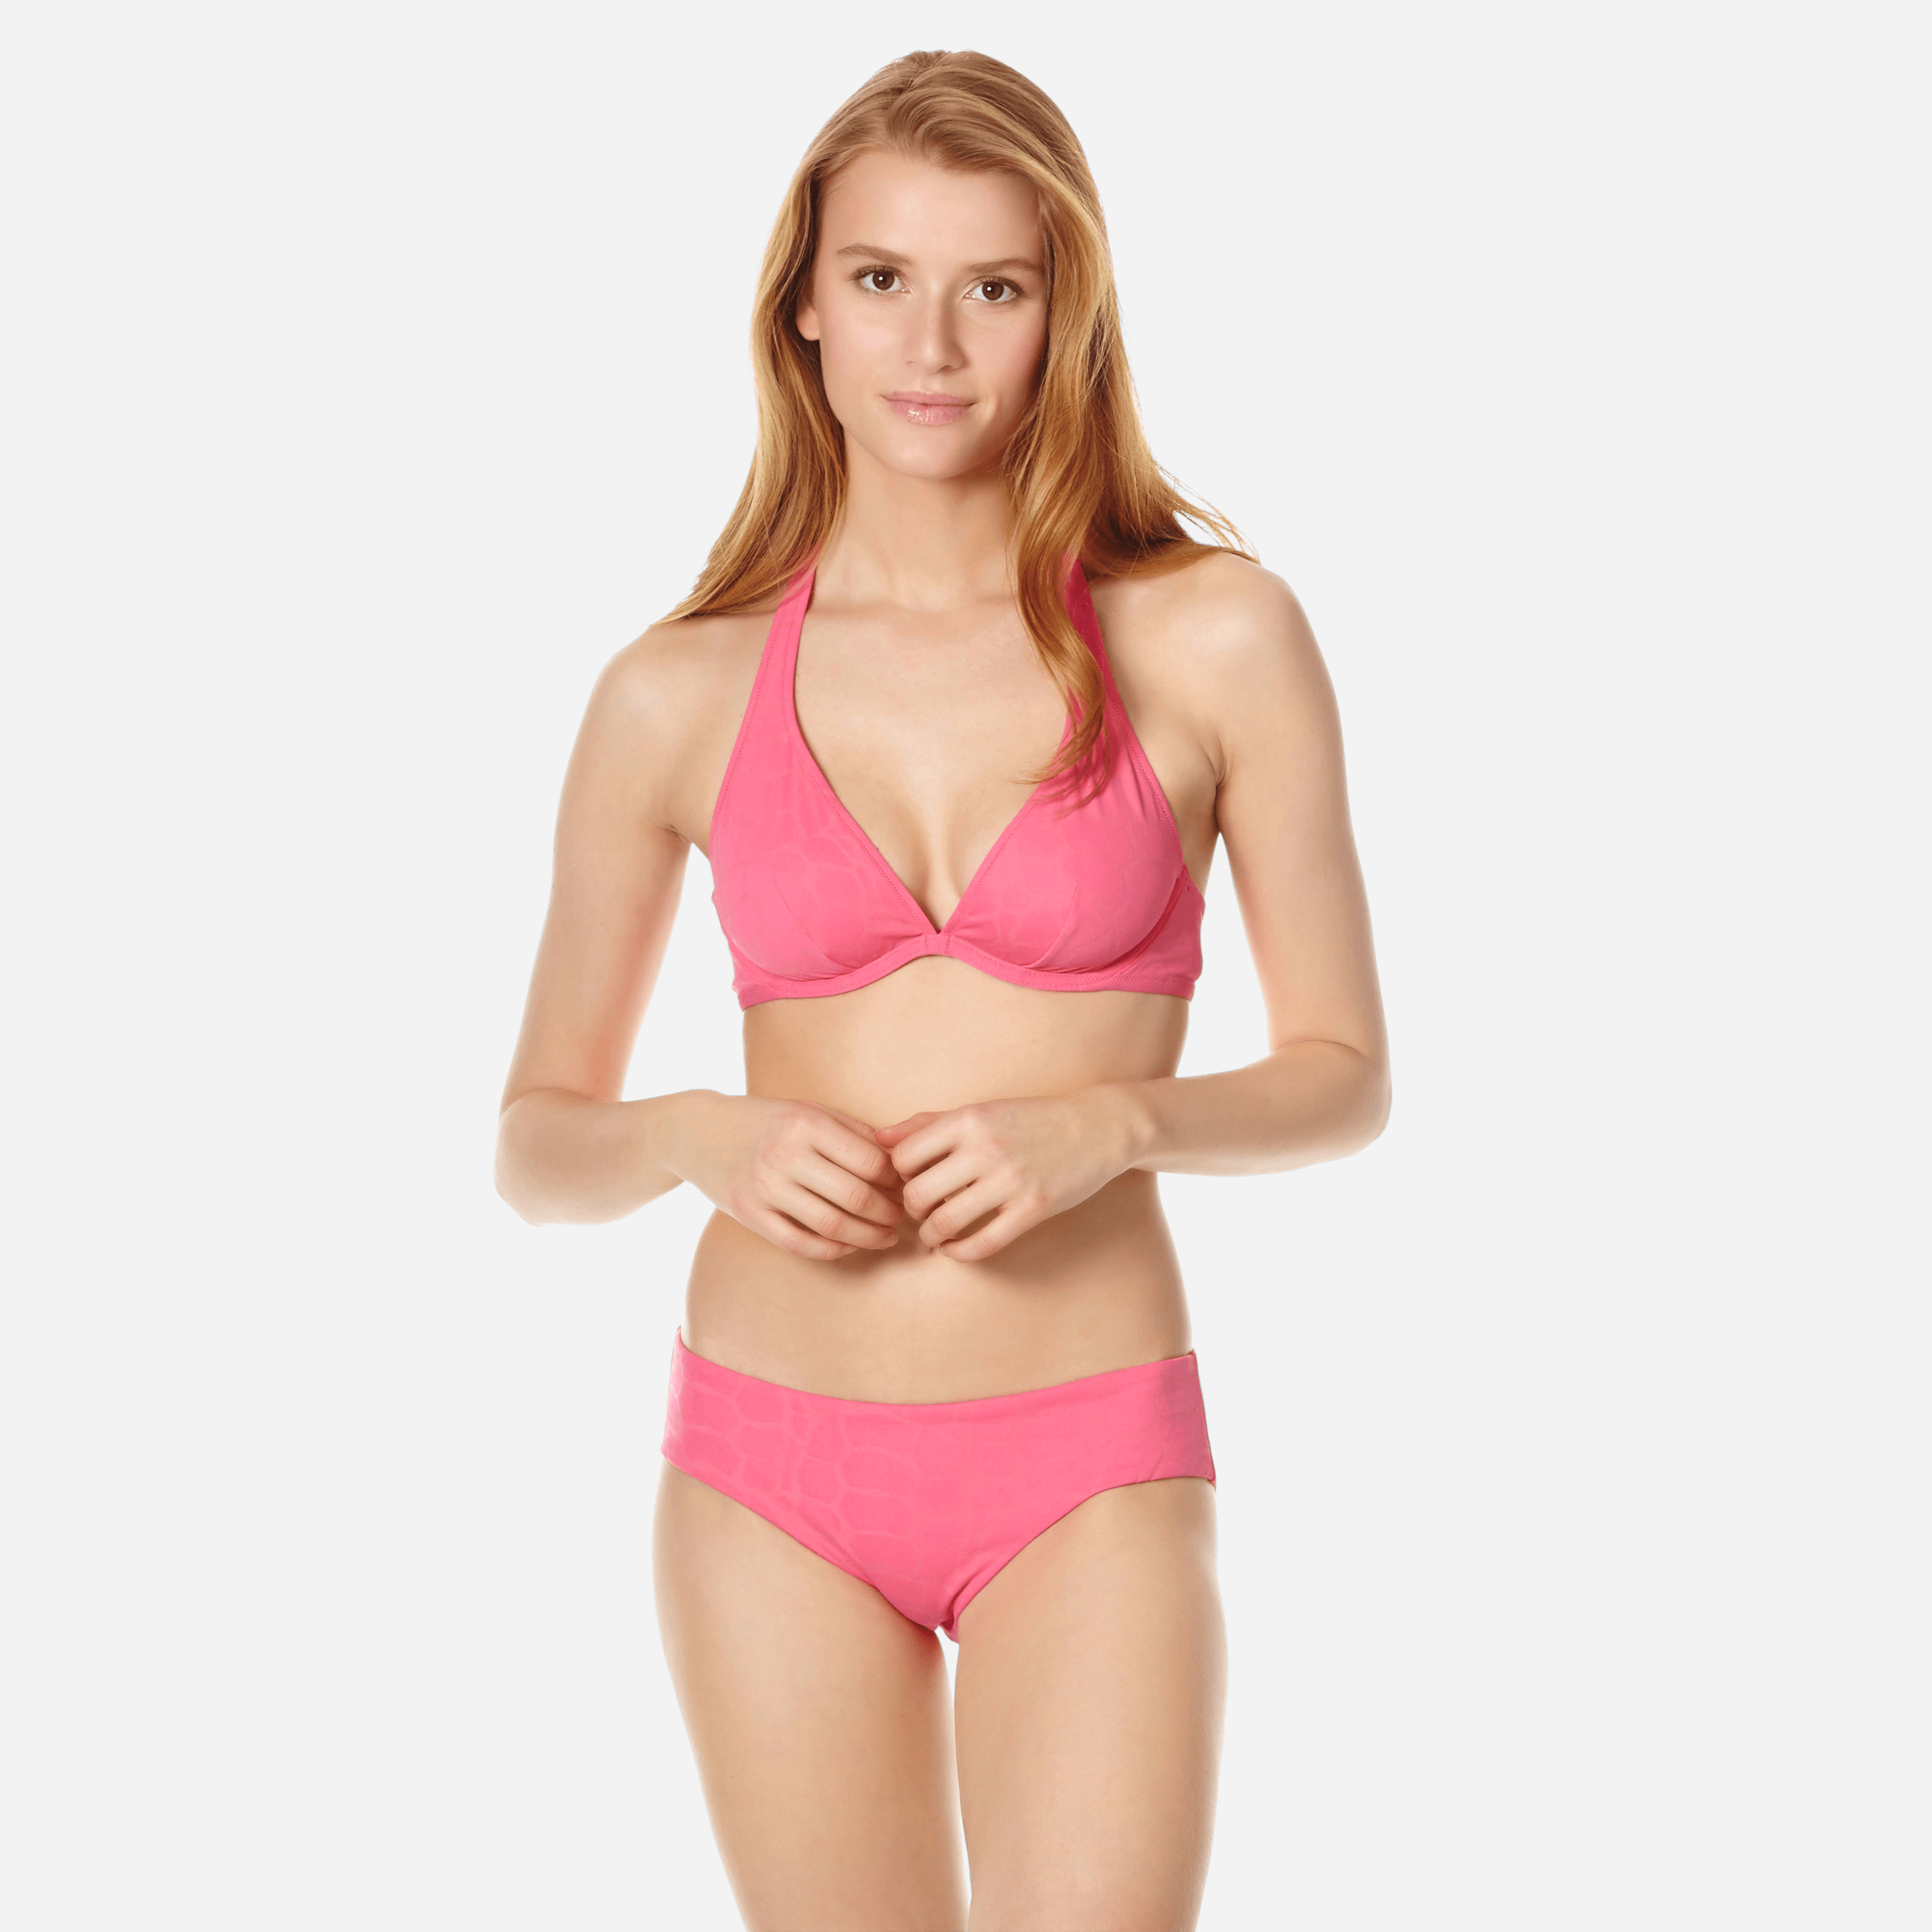 VILEBREQUIN | Women Swimwear - Women Bikini Top With Underwires Ecailles De Tortue - SWIMMING TRUNK - FAITH - Pink - XXS - Vilebrequin | Goxip